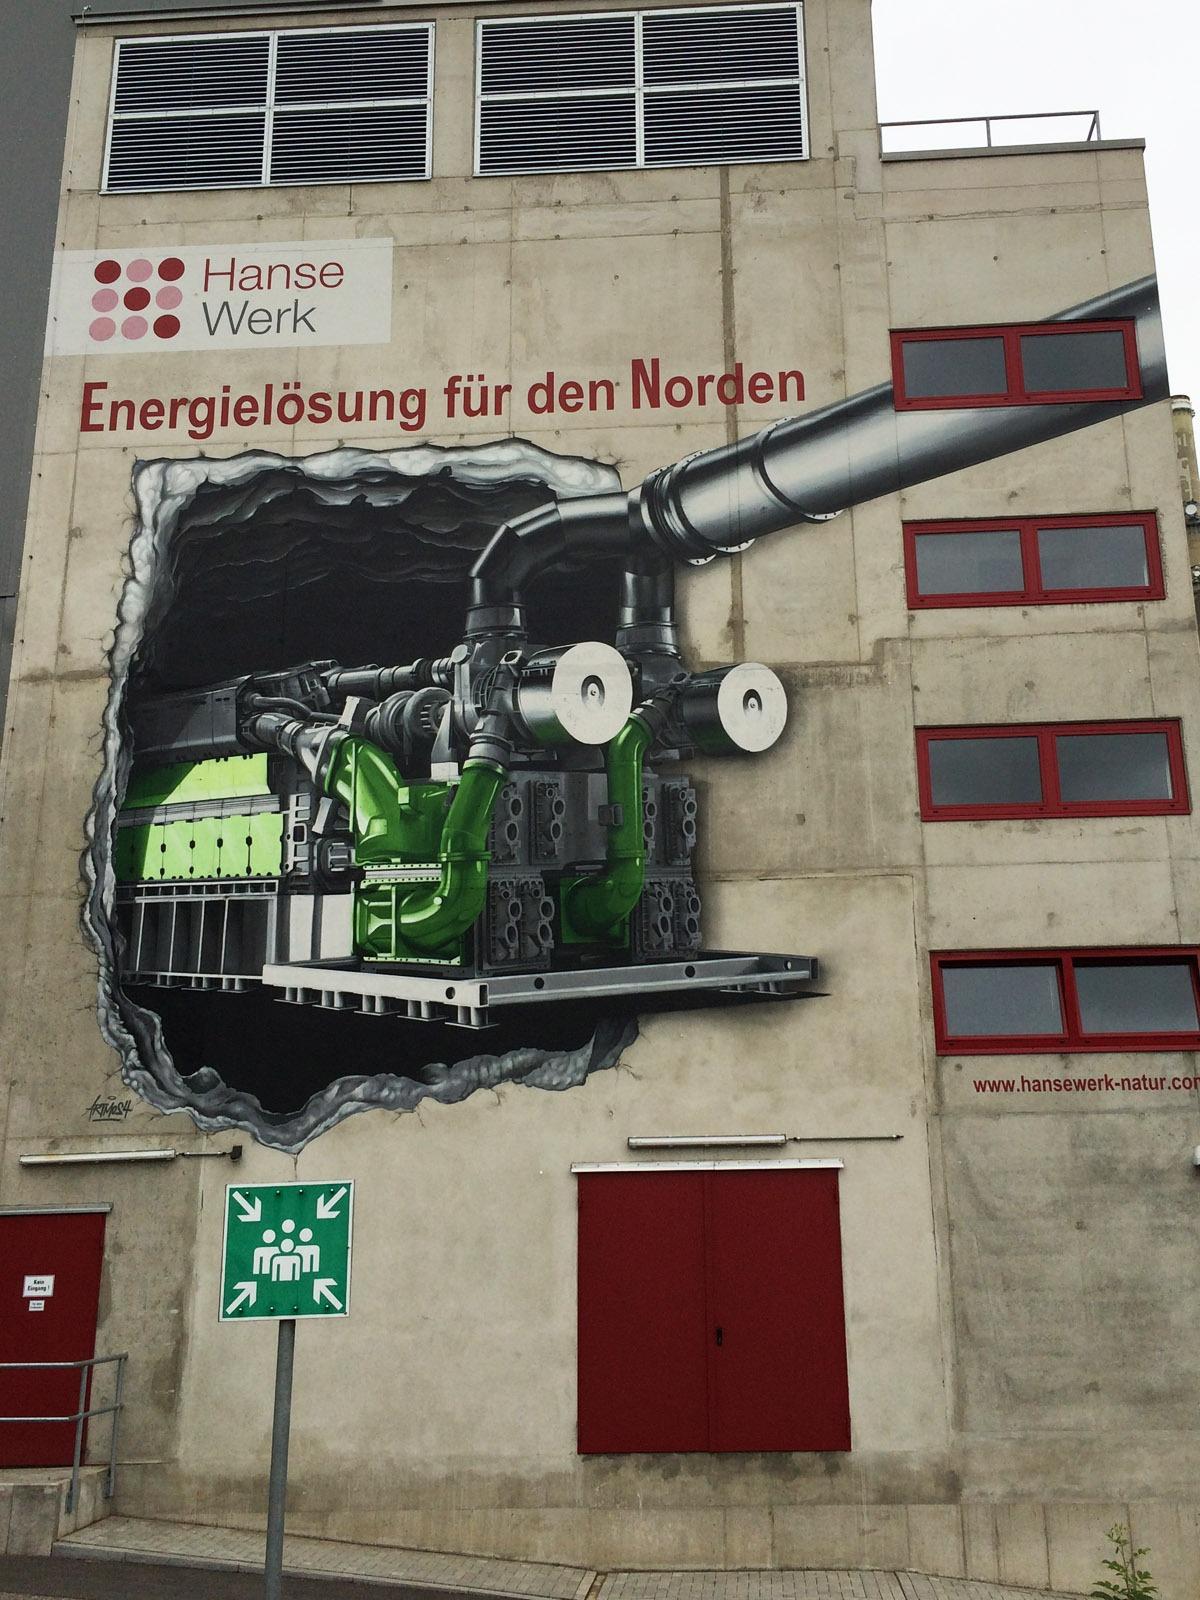 graffitiauftrag-graffitikuenstler-artmos4-hansewerk-2016-mauer-rohre-schrift-grau-gruen-fotorealistisch-aussen-energieversorger